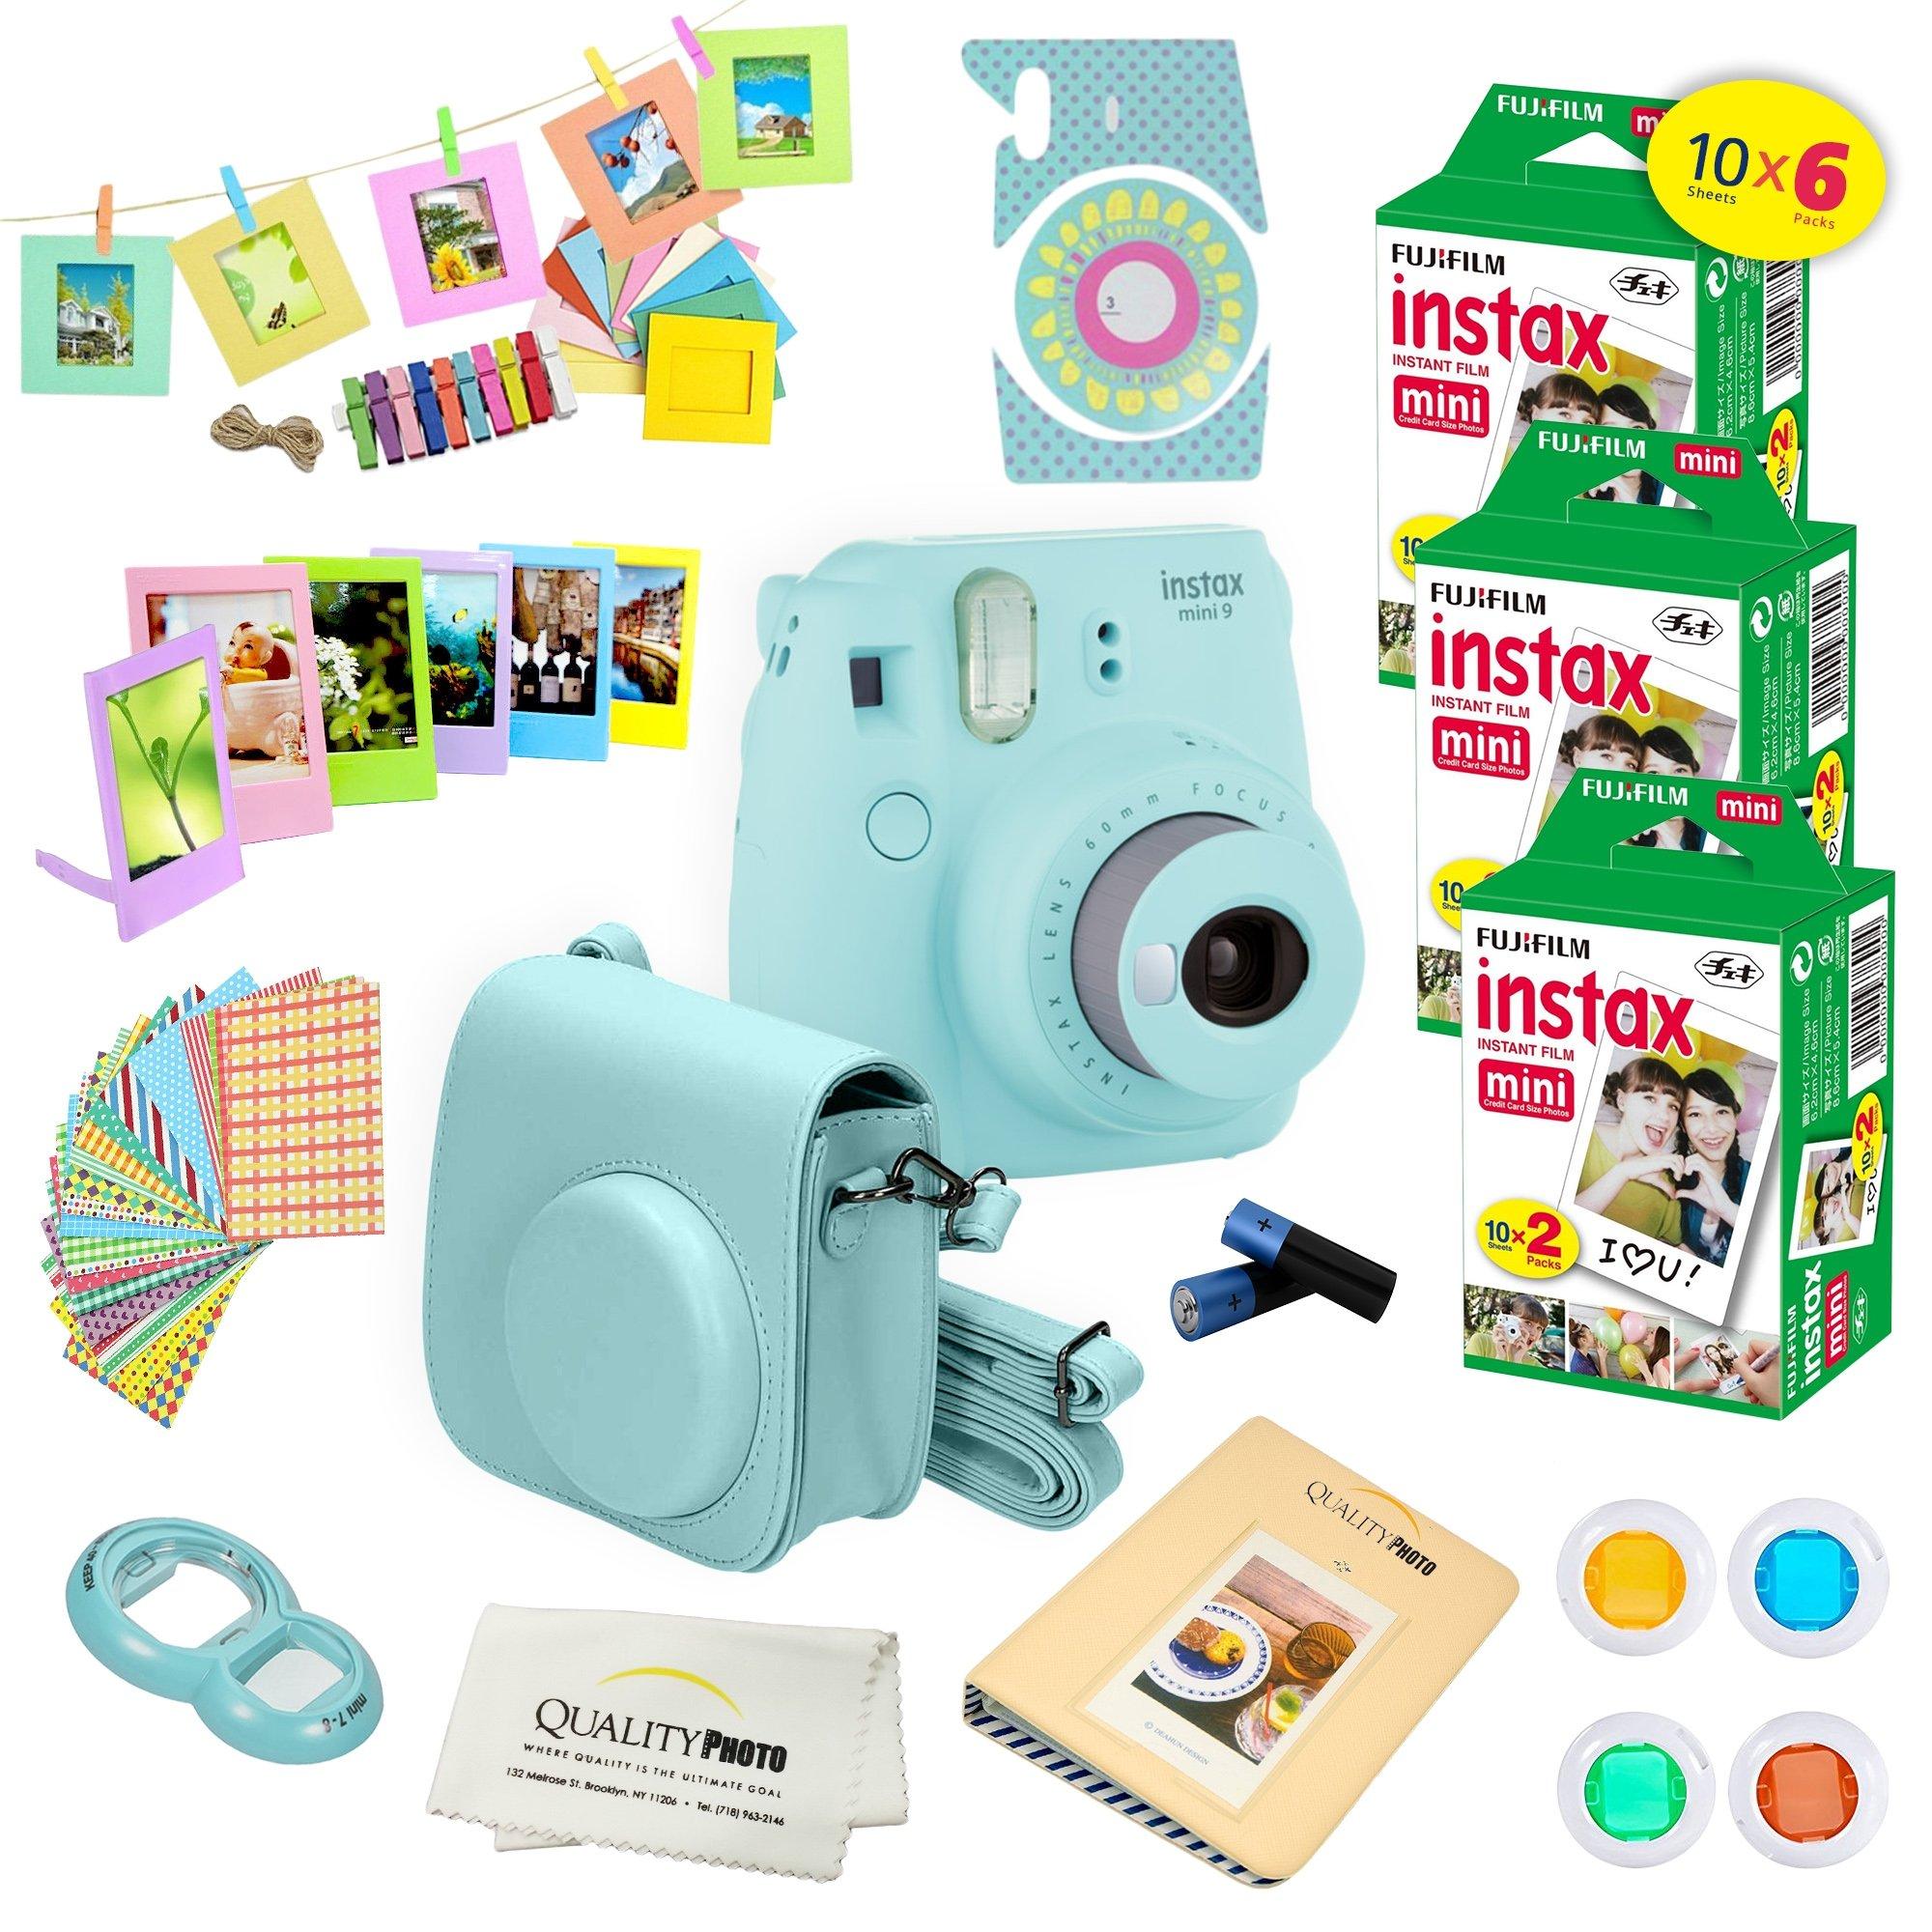 Fujifilm Instax Mini 9 Instant Camera ICE BLUE w/ Fujifilm Instax Mini 9 Instant Films (60 Pack) + A14 Pc Deluxe Bundle For Fujifilm Instax Mini 9 Camera by Fujifilm